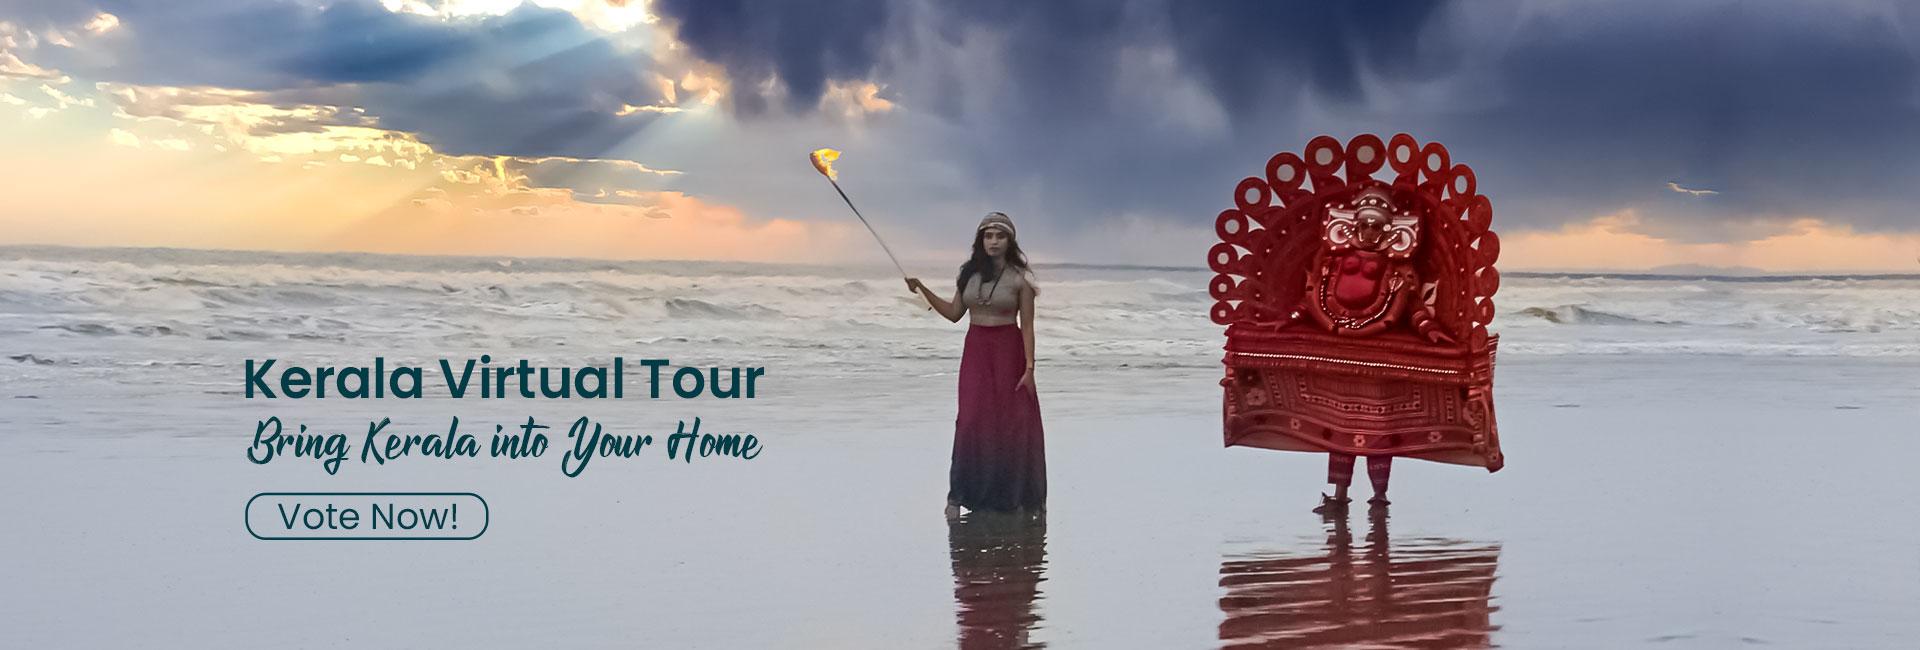 Virtual Tour Campaign - Culture Trail